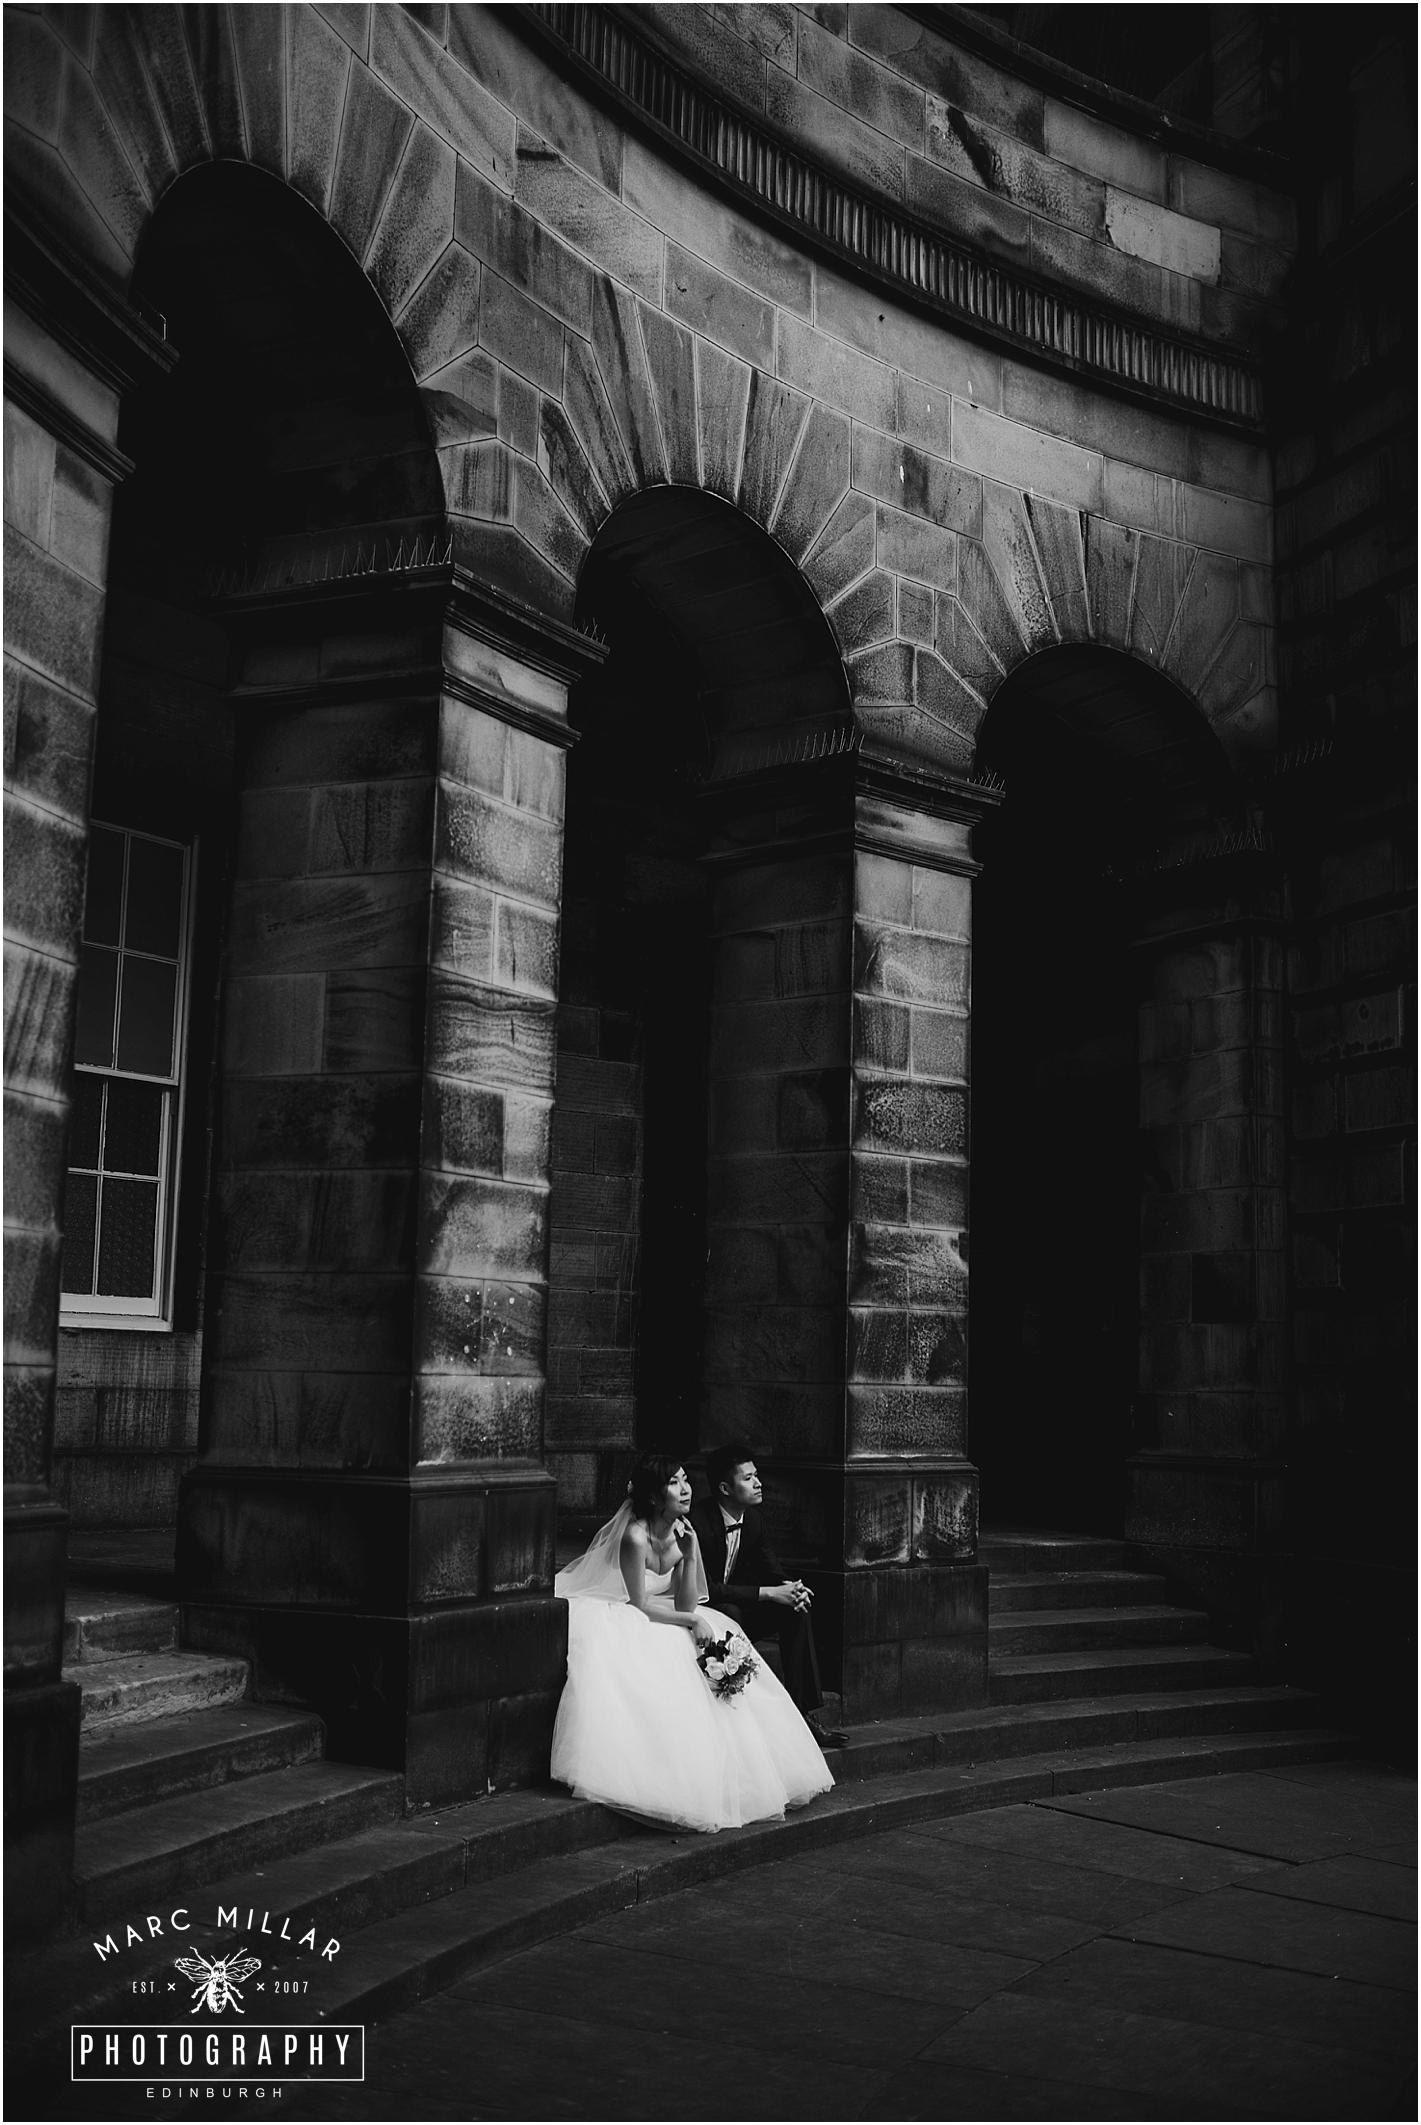 Marc Millar Wedding Photography